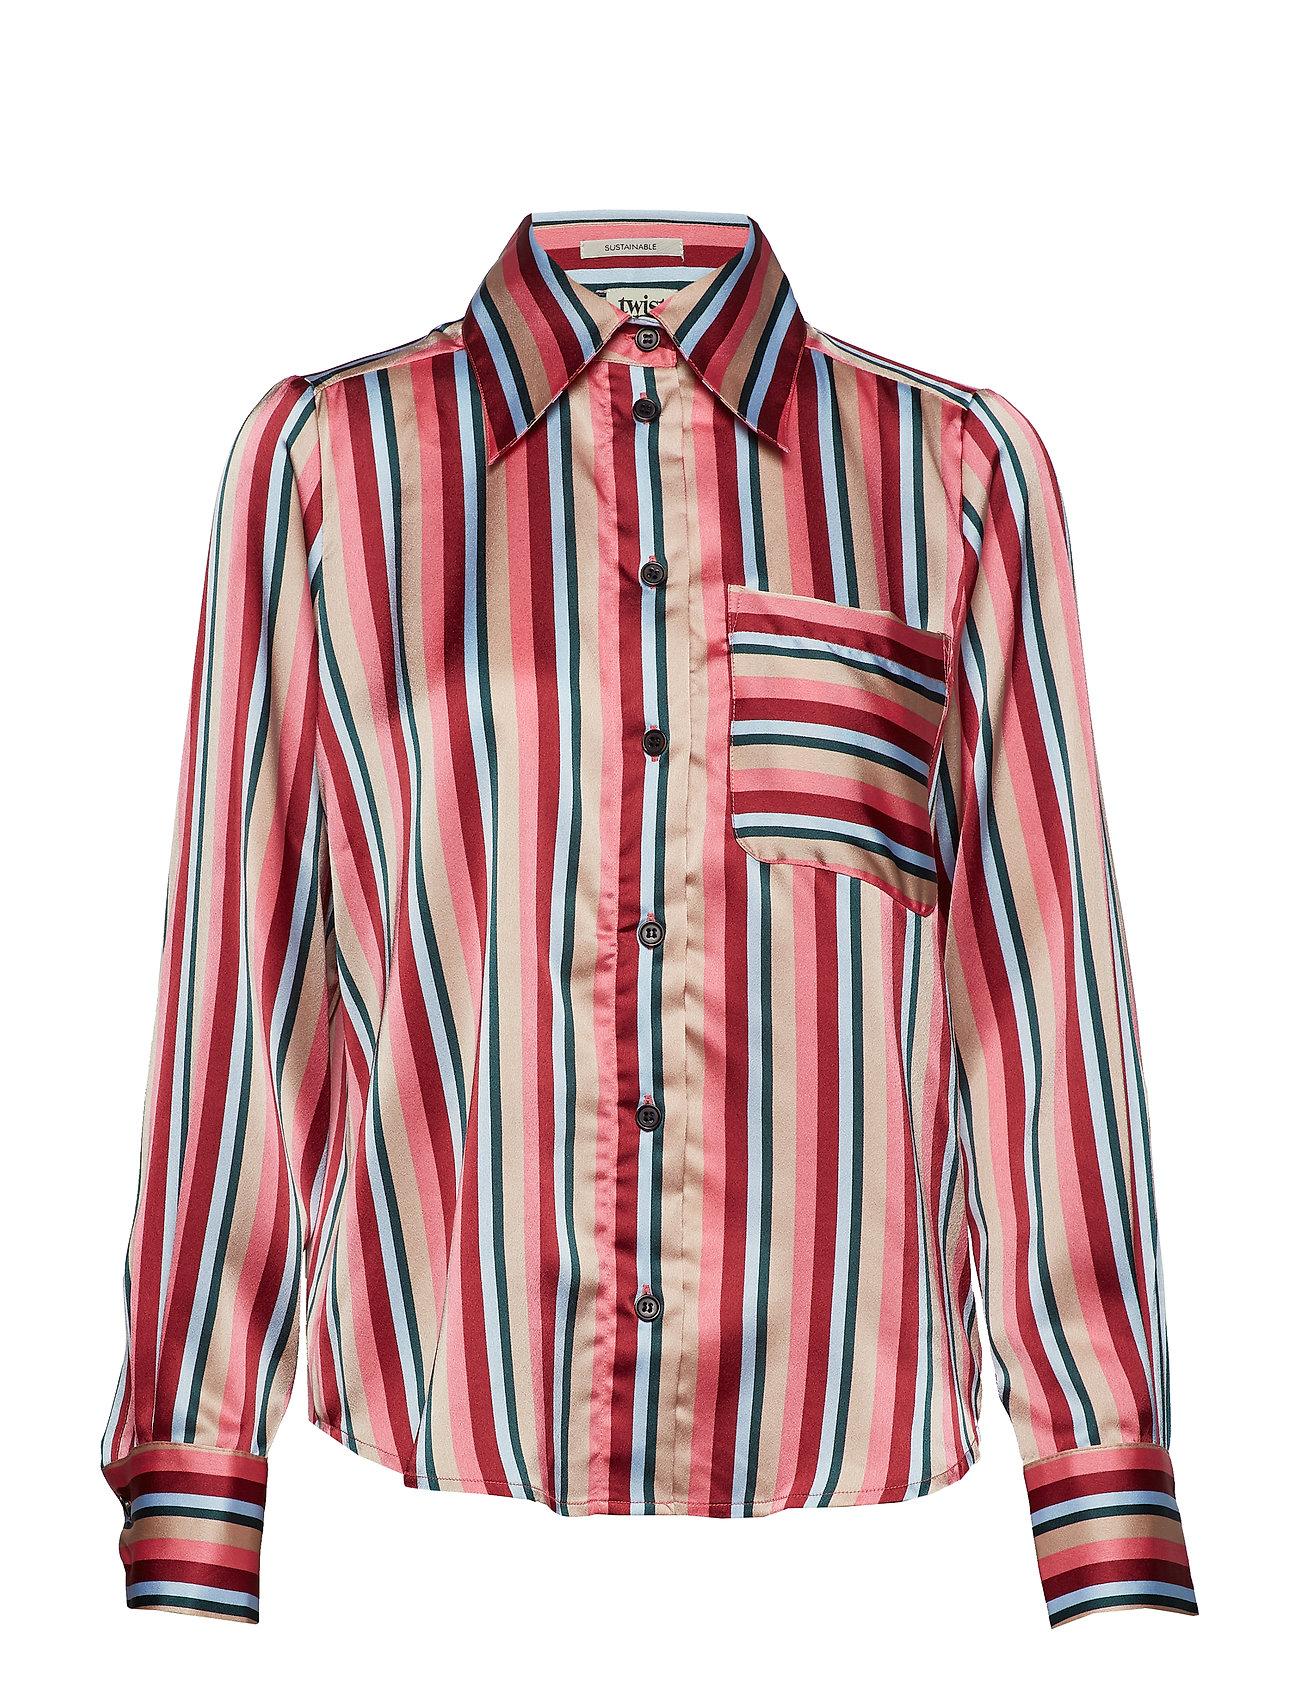 a86bbde9 Nathalie Shirt Pink Stripe (Pink Stripe) (779.35 kr) - Twist & Tango ...